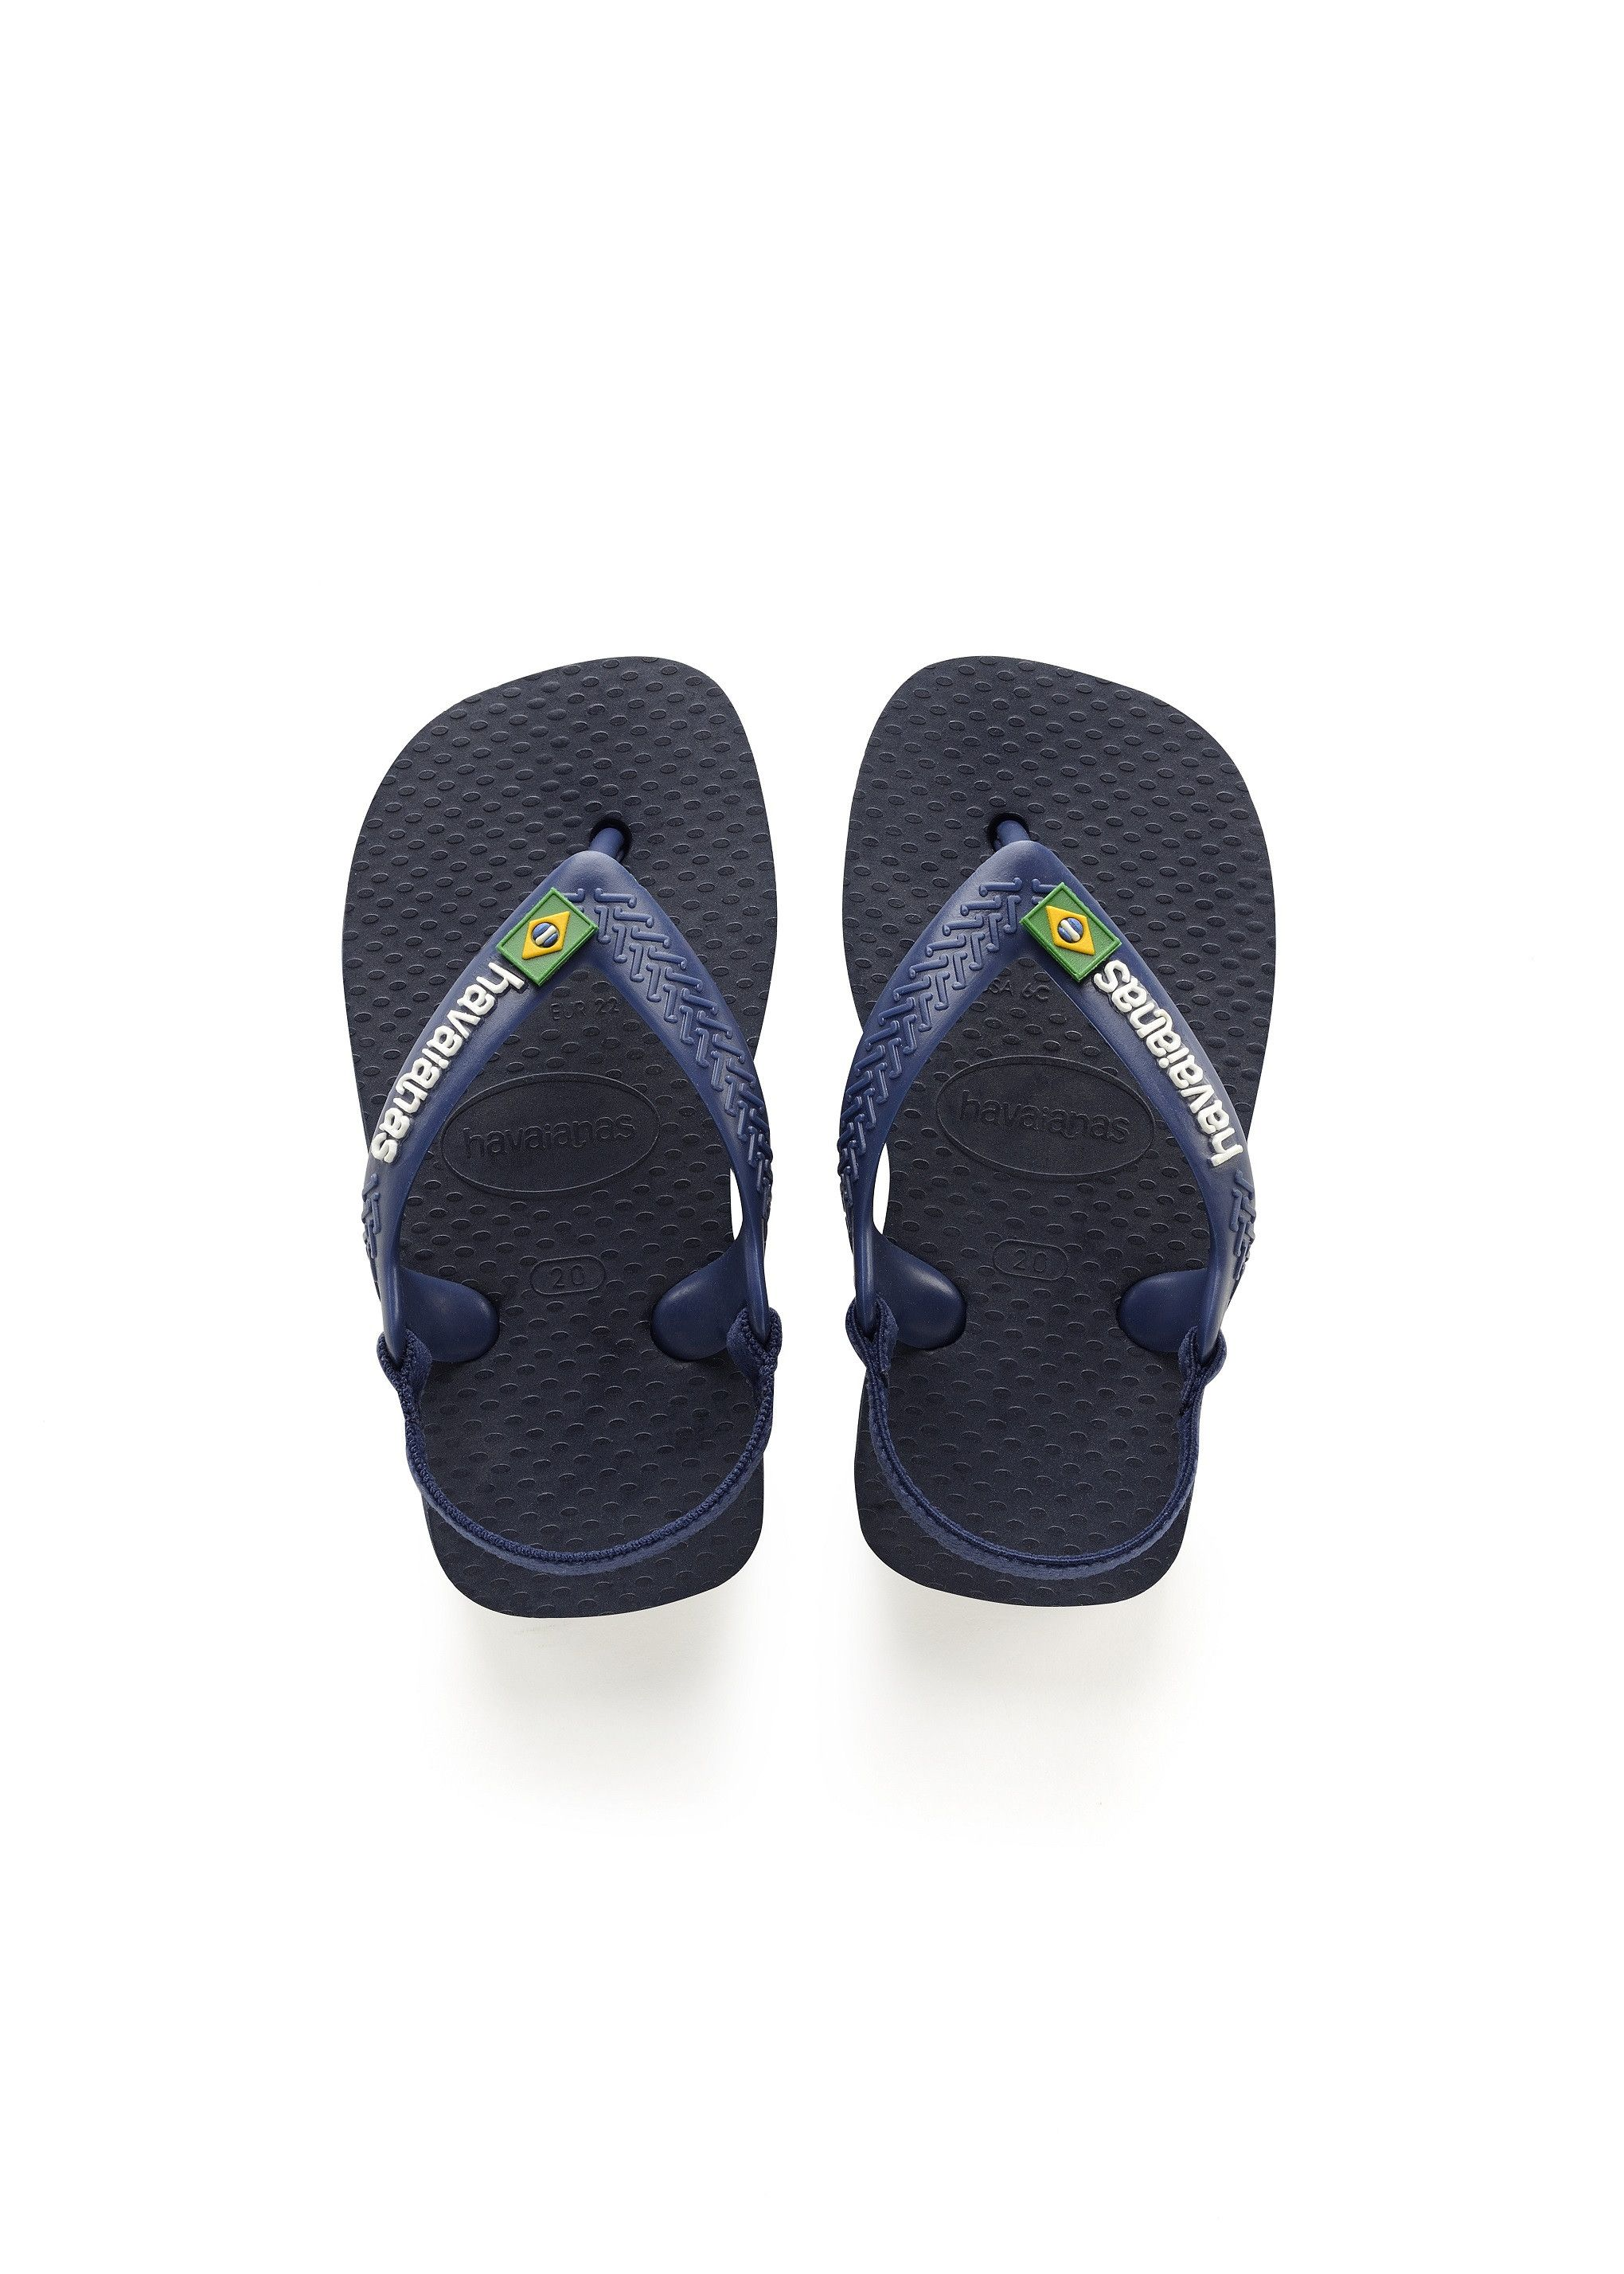 2f51b39049983d Havaianas Baby Brazil Logo Sandal Navy Blue Citrus Yellow Price From  14